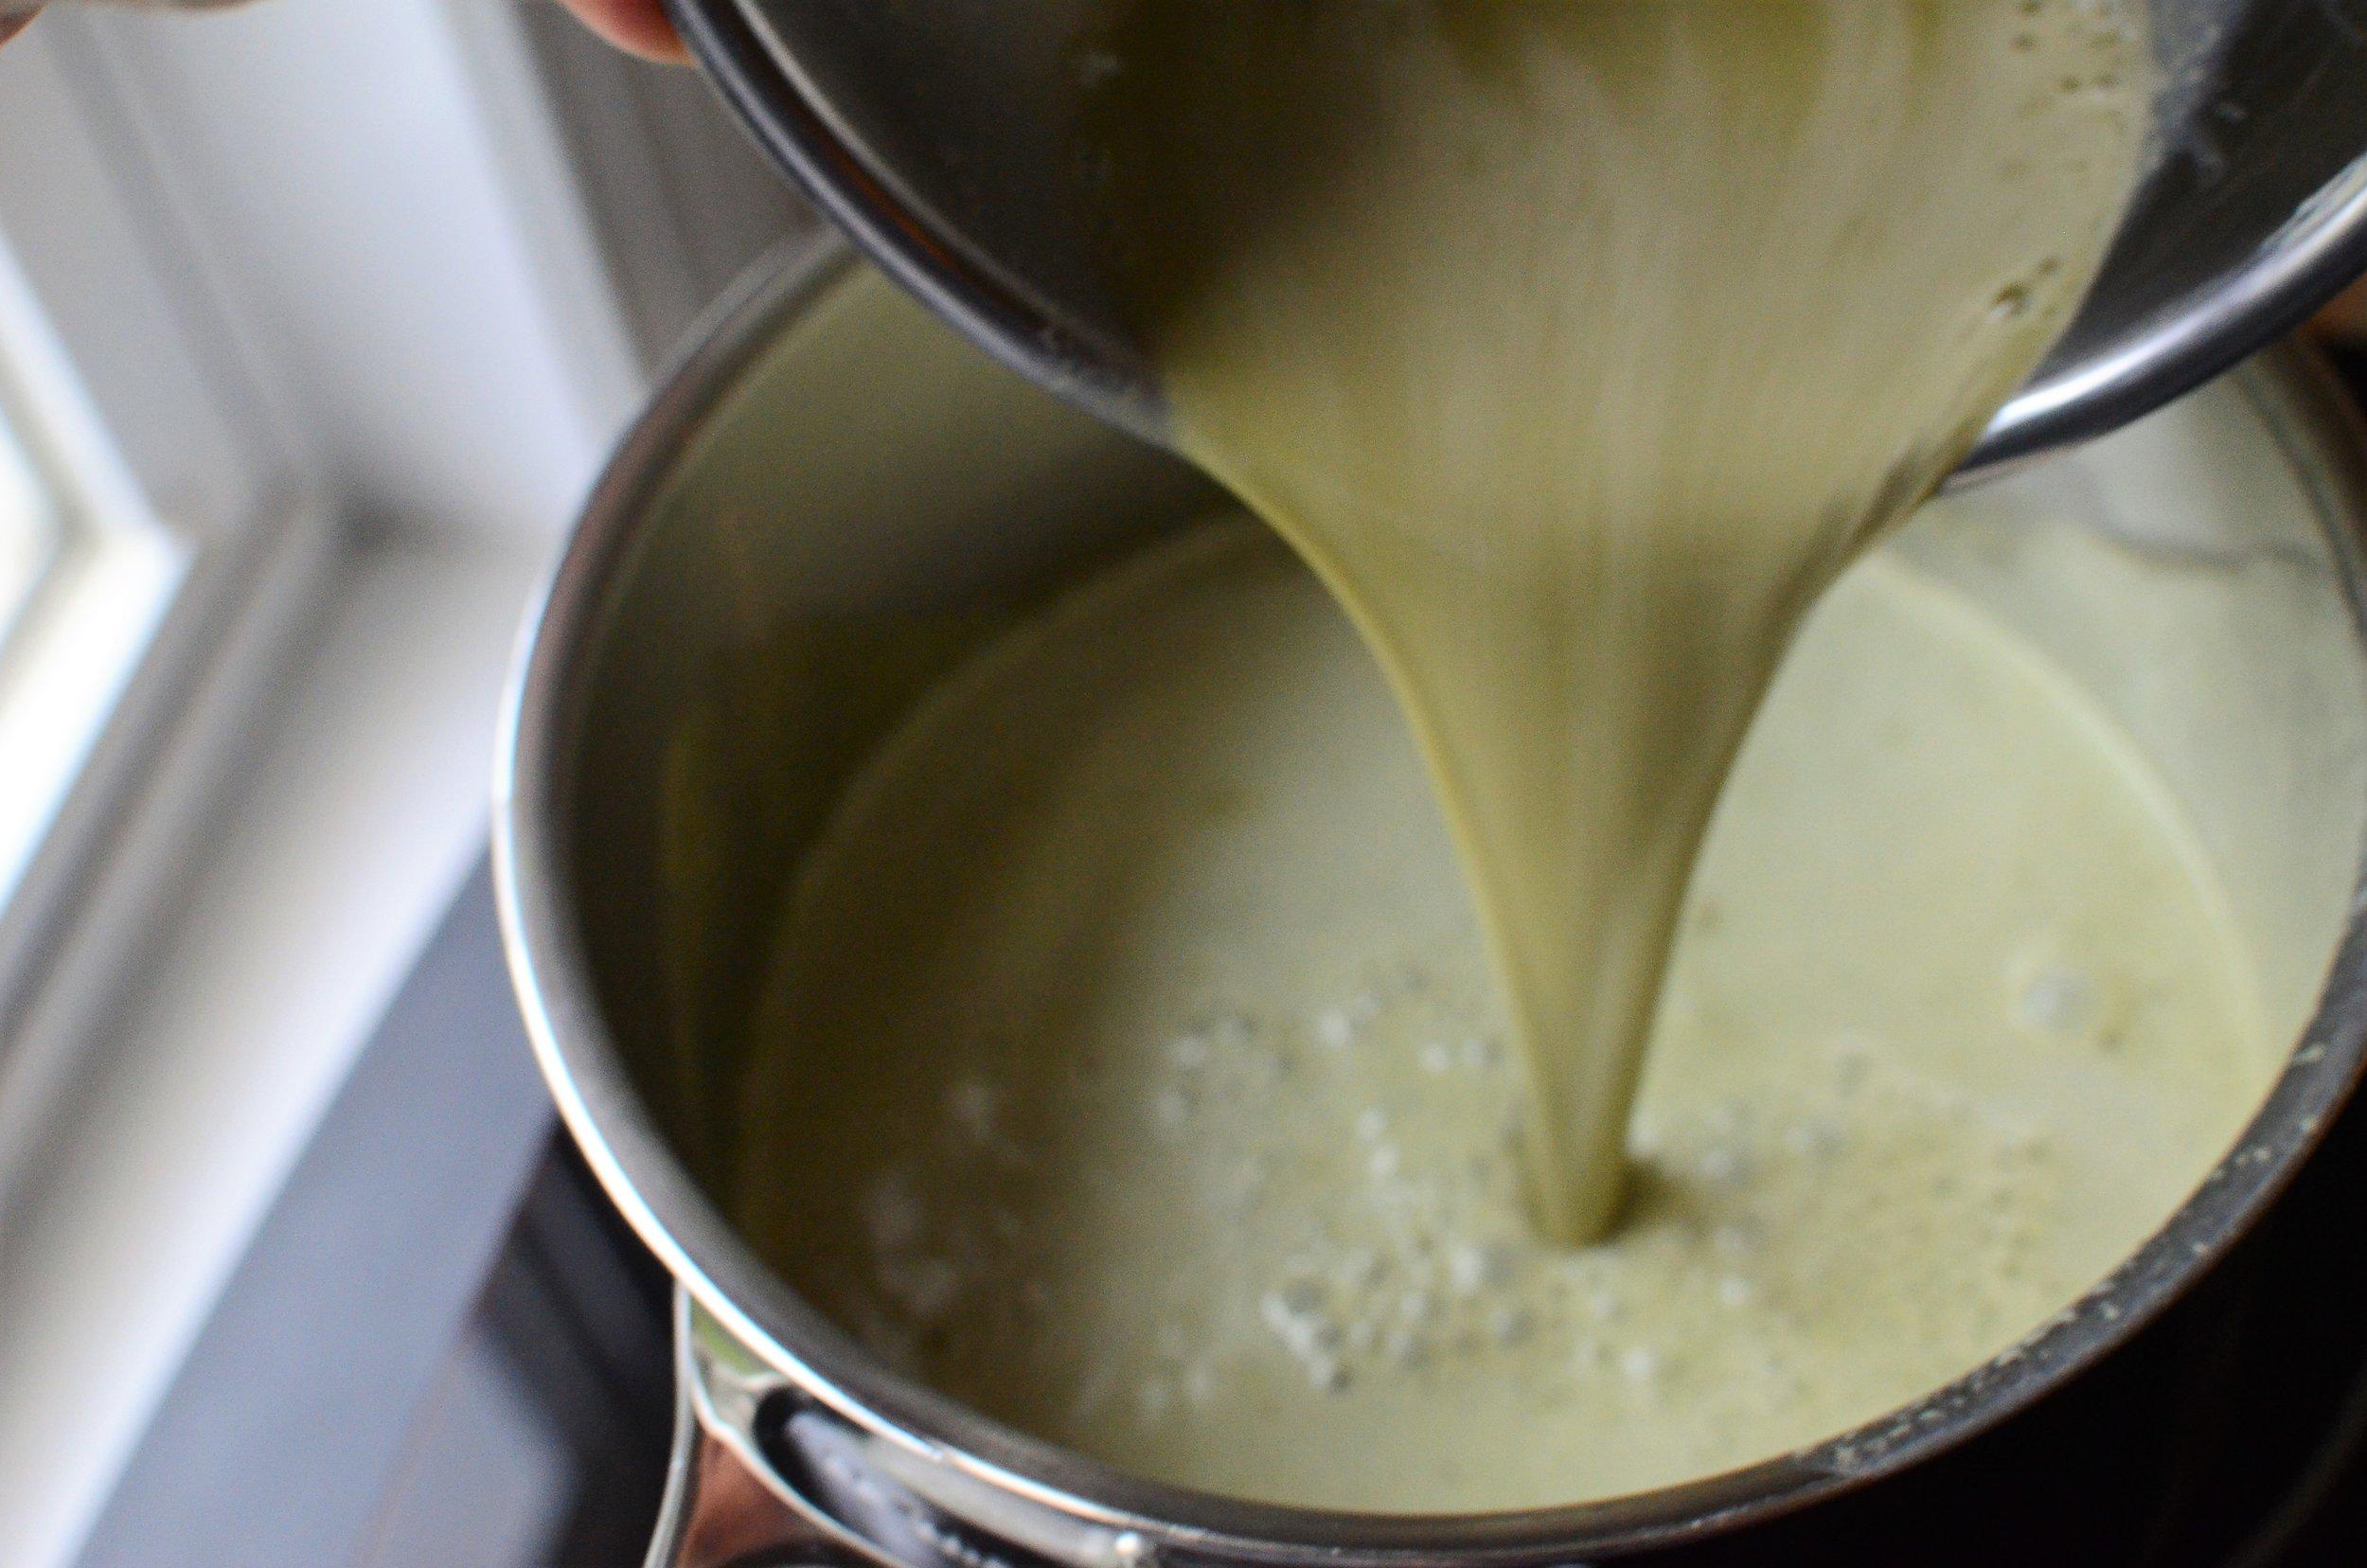 how to make matcha ice cream. how to make green tea ice cream - recipe and how-to photo. ButterYum